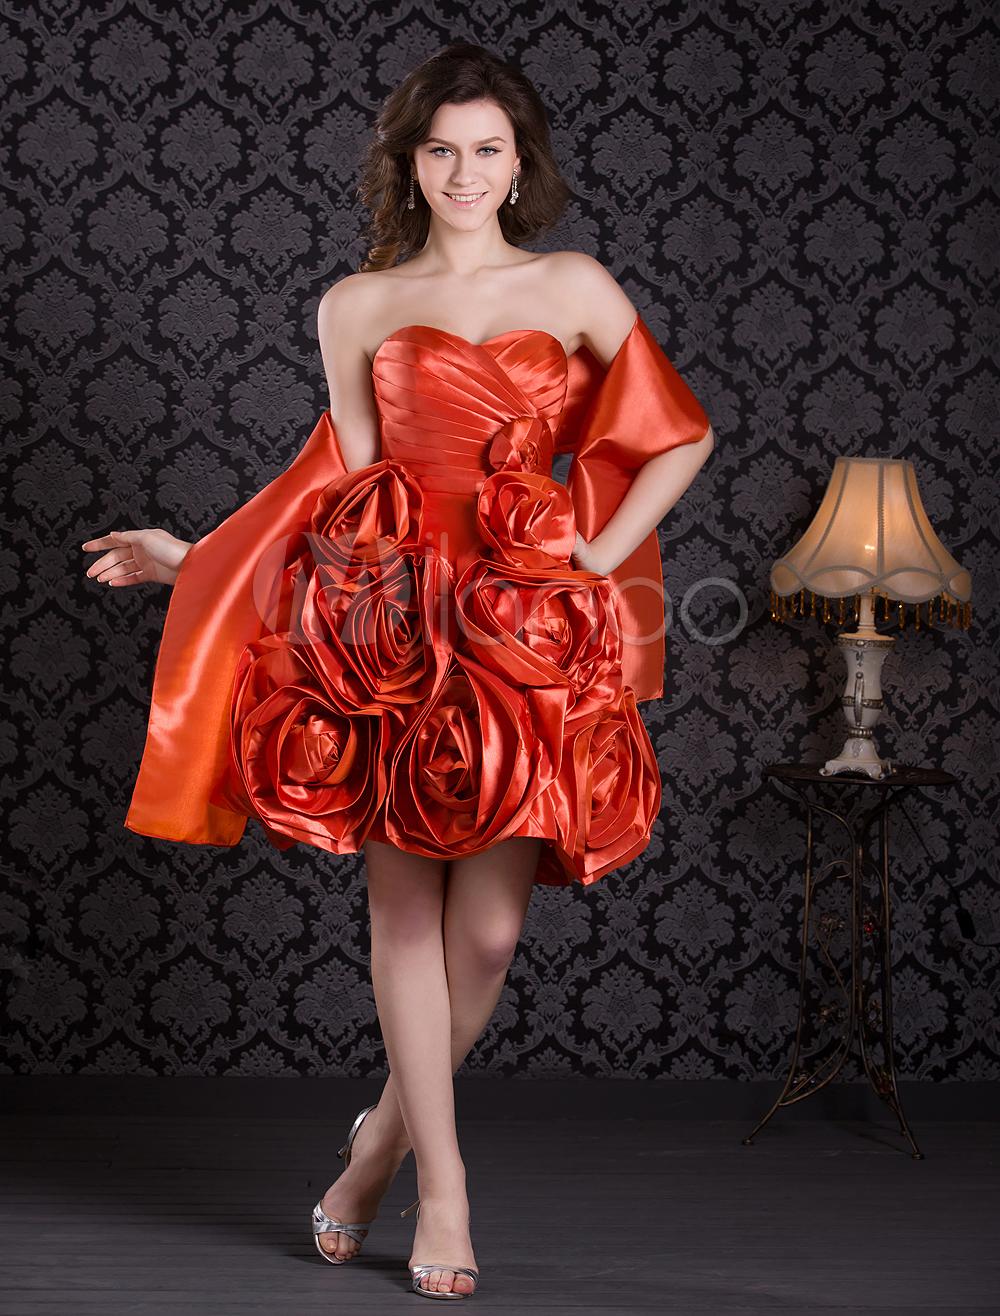 Princess Silhouette Strapless Orange Taffeta Prom Dress with Flower